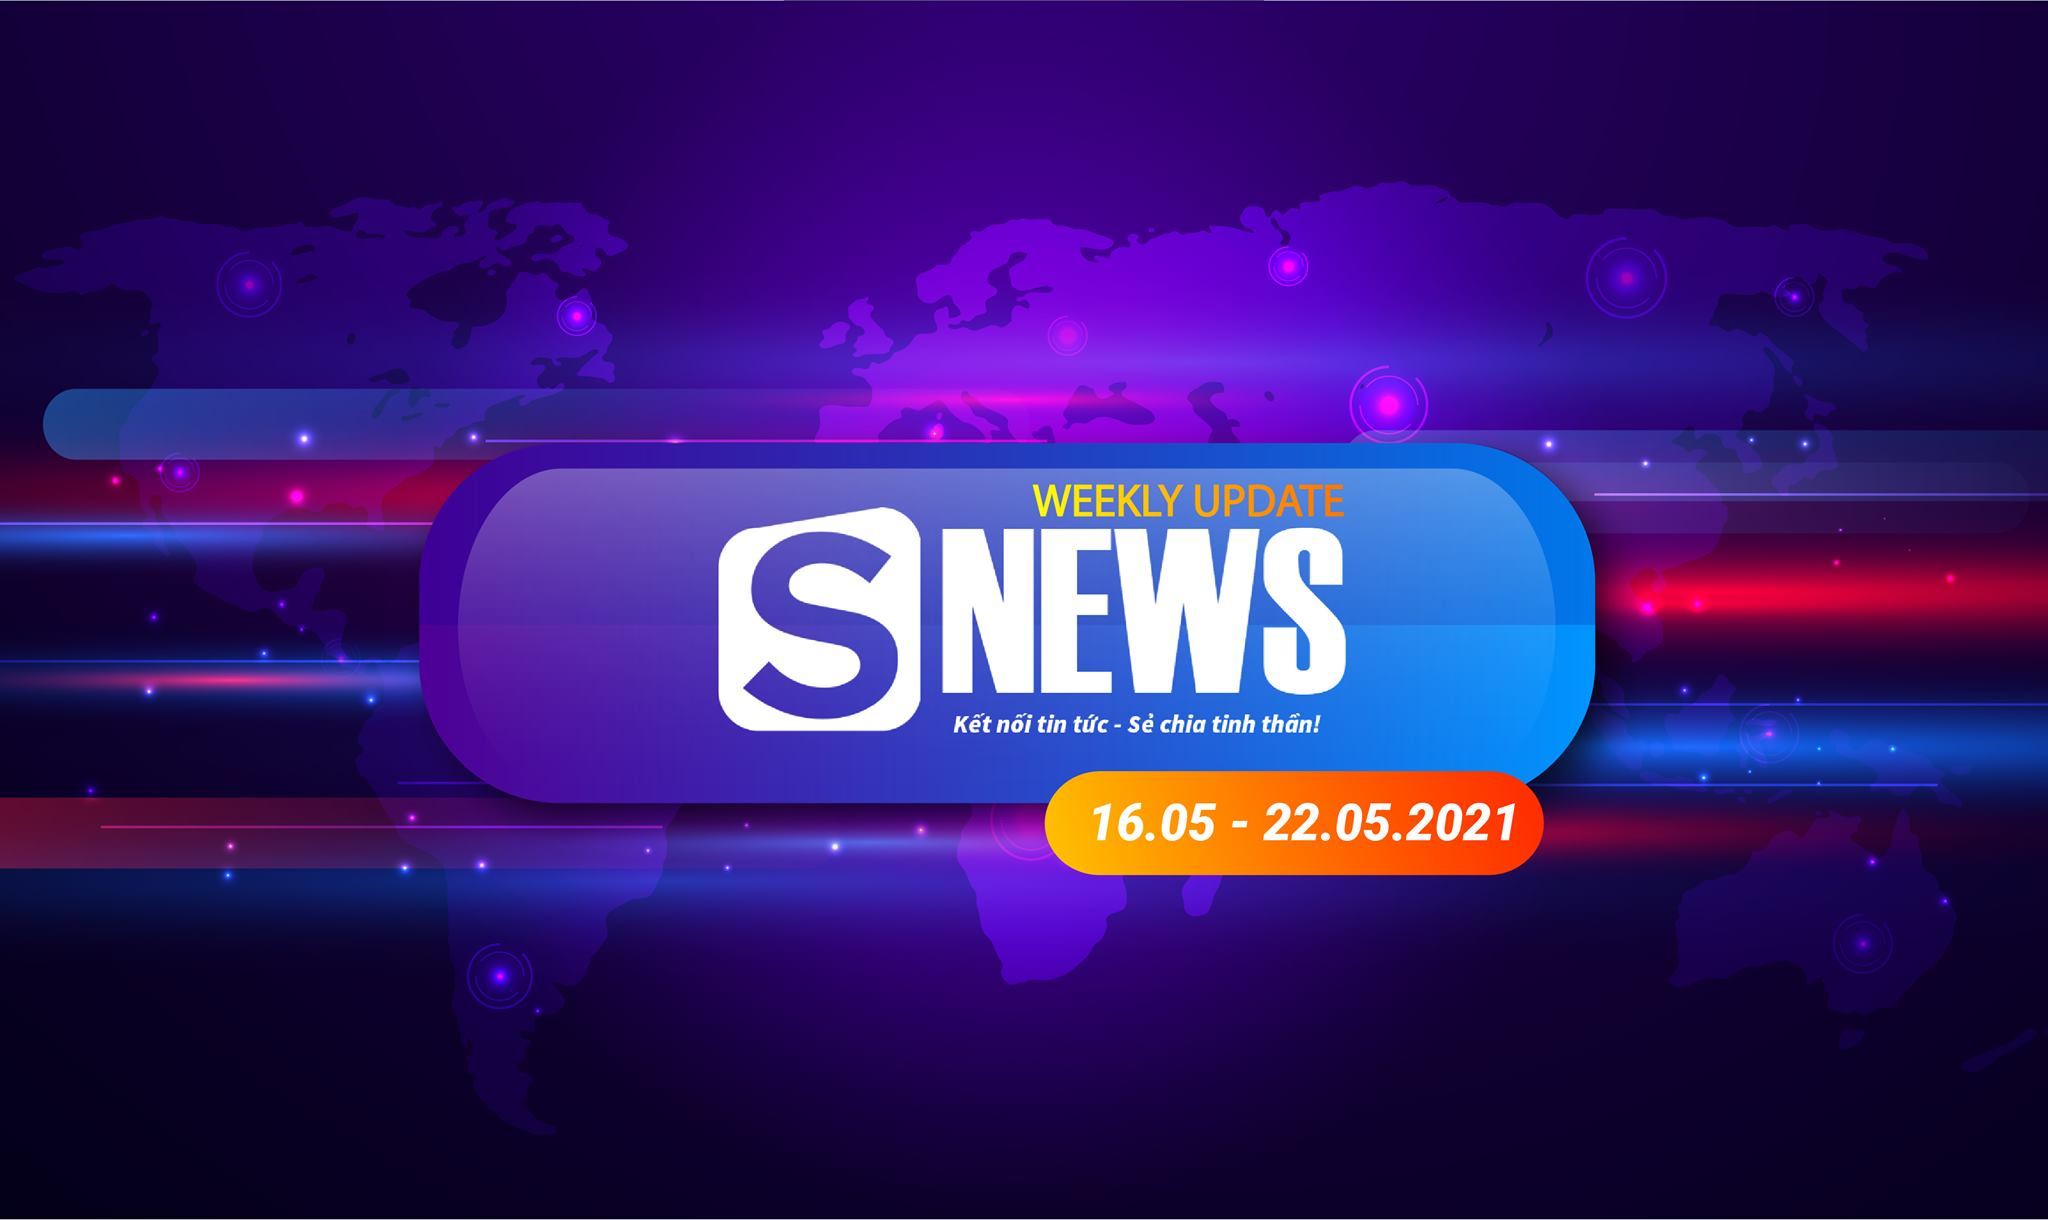 Tổng hợp tin tức Sapo tuần qua: 16.05.2021 - 22.05.2021